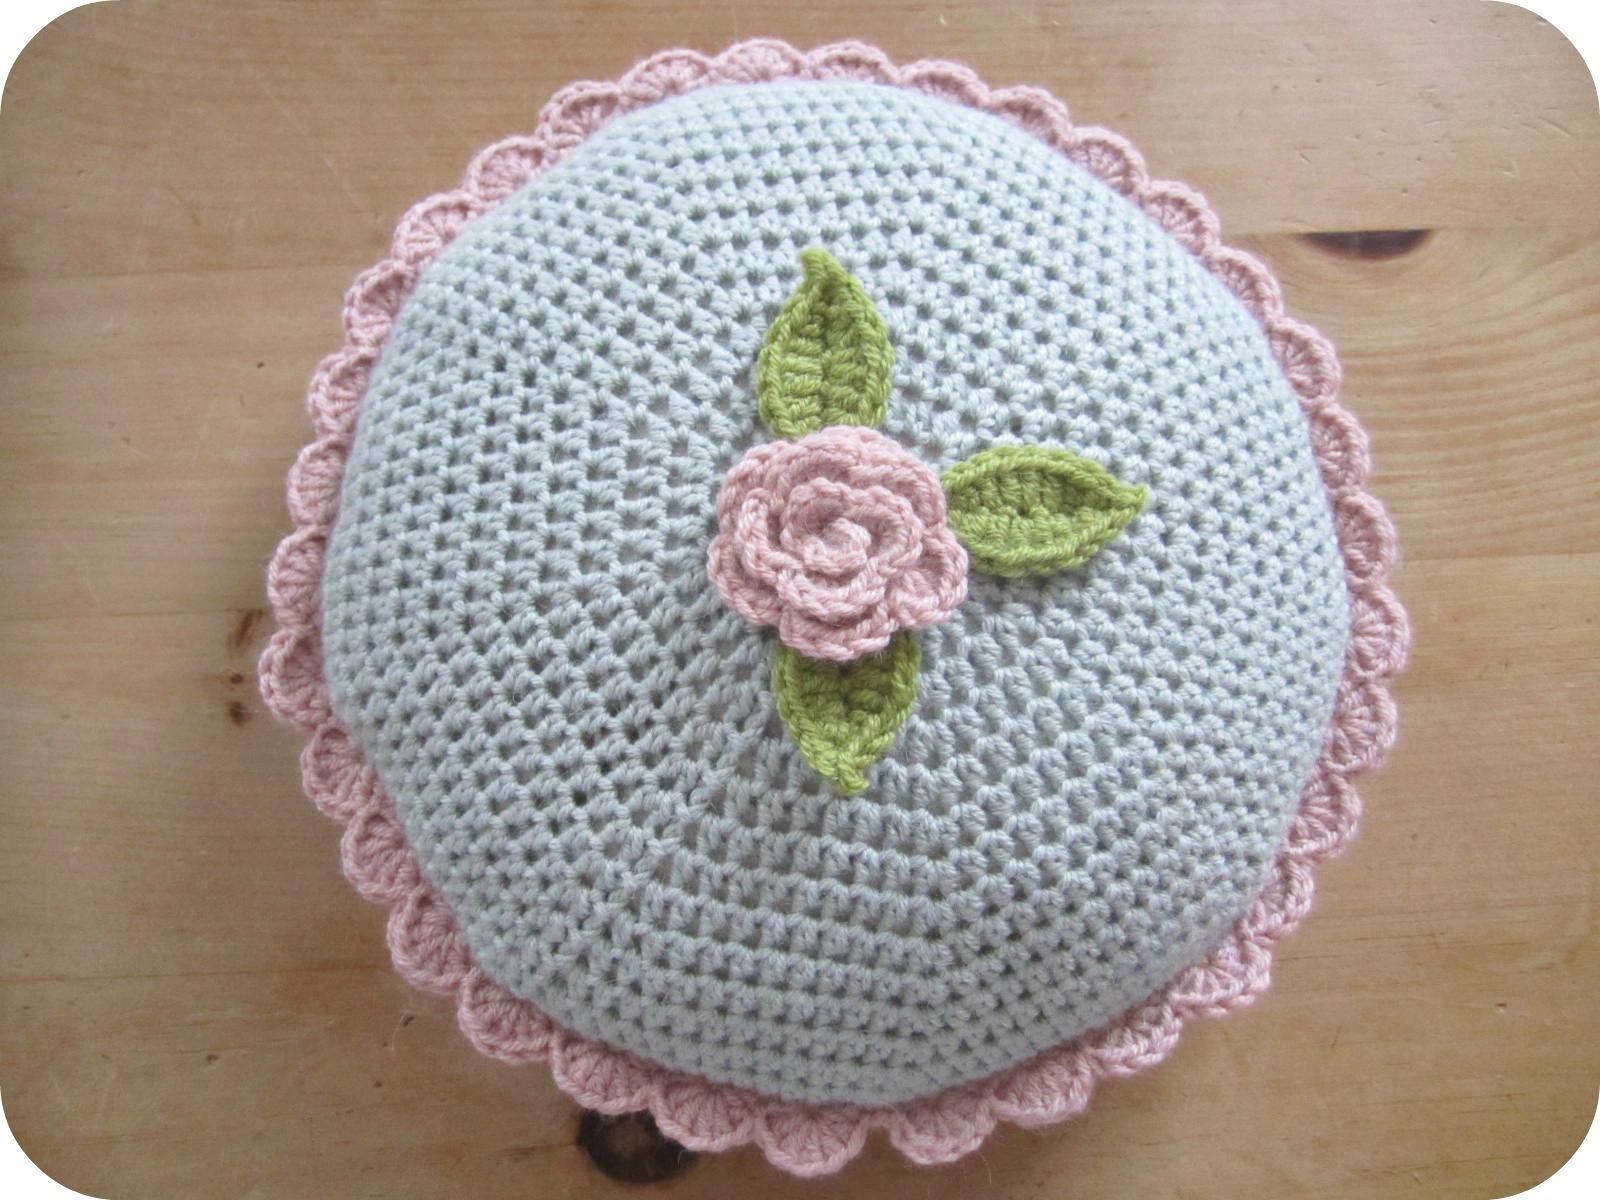 Pink Milk: How I Crocheted My Round Cushion